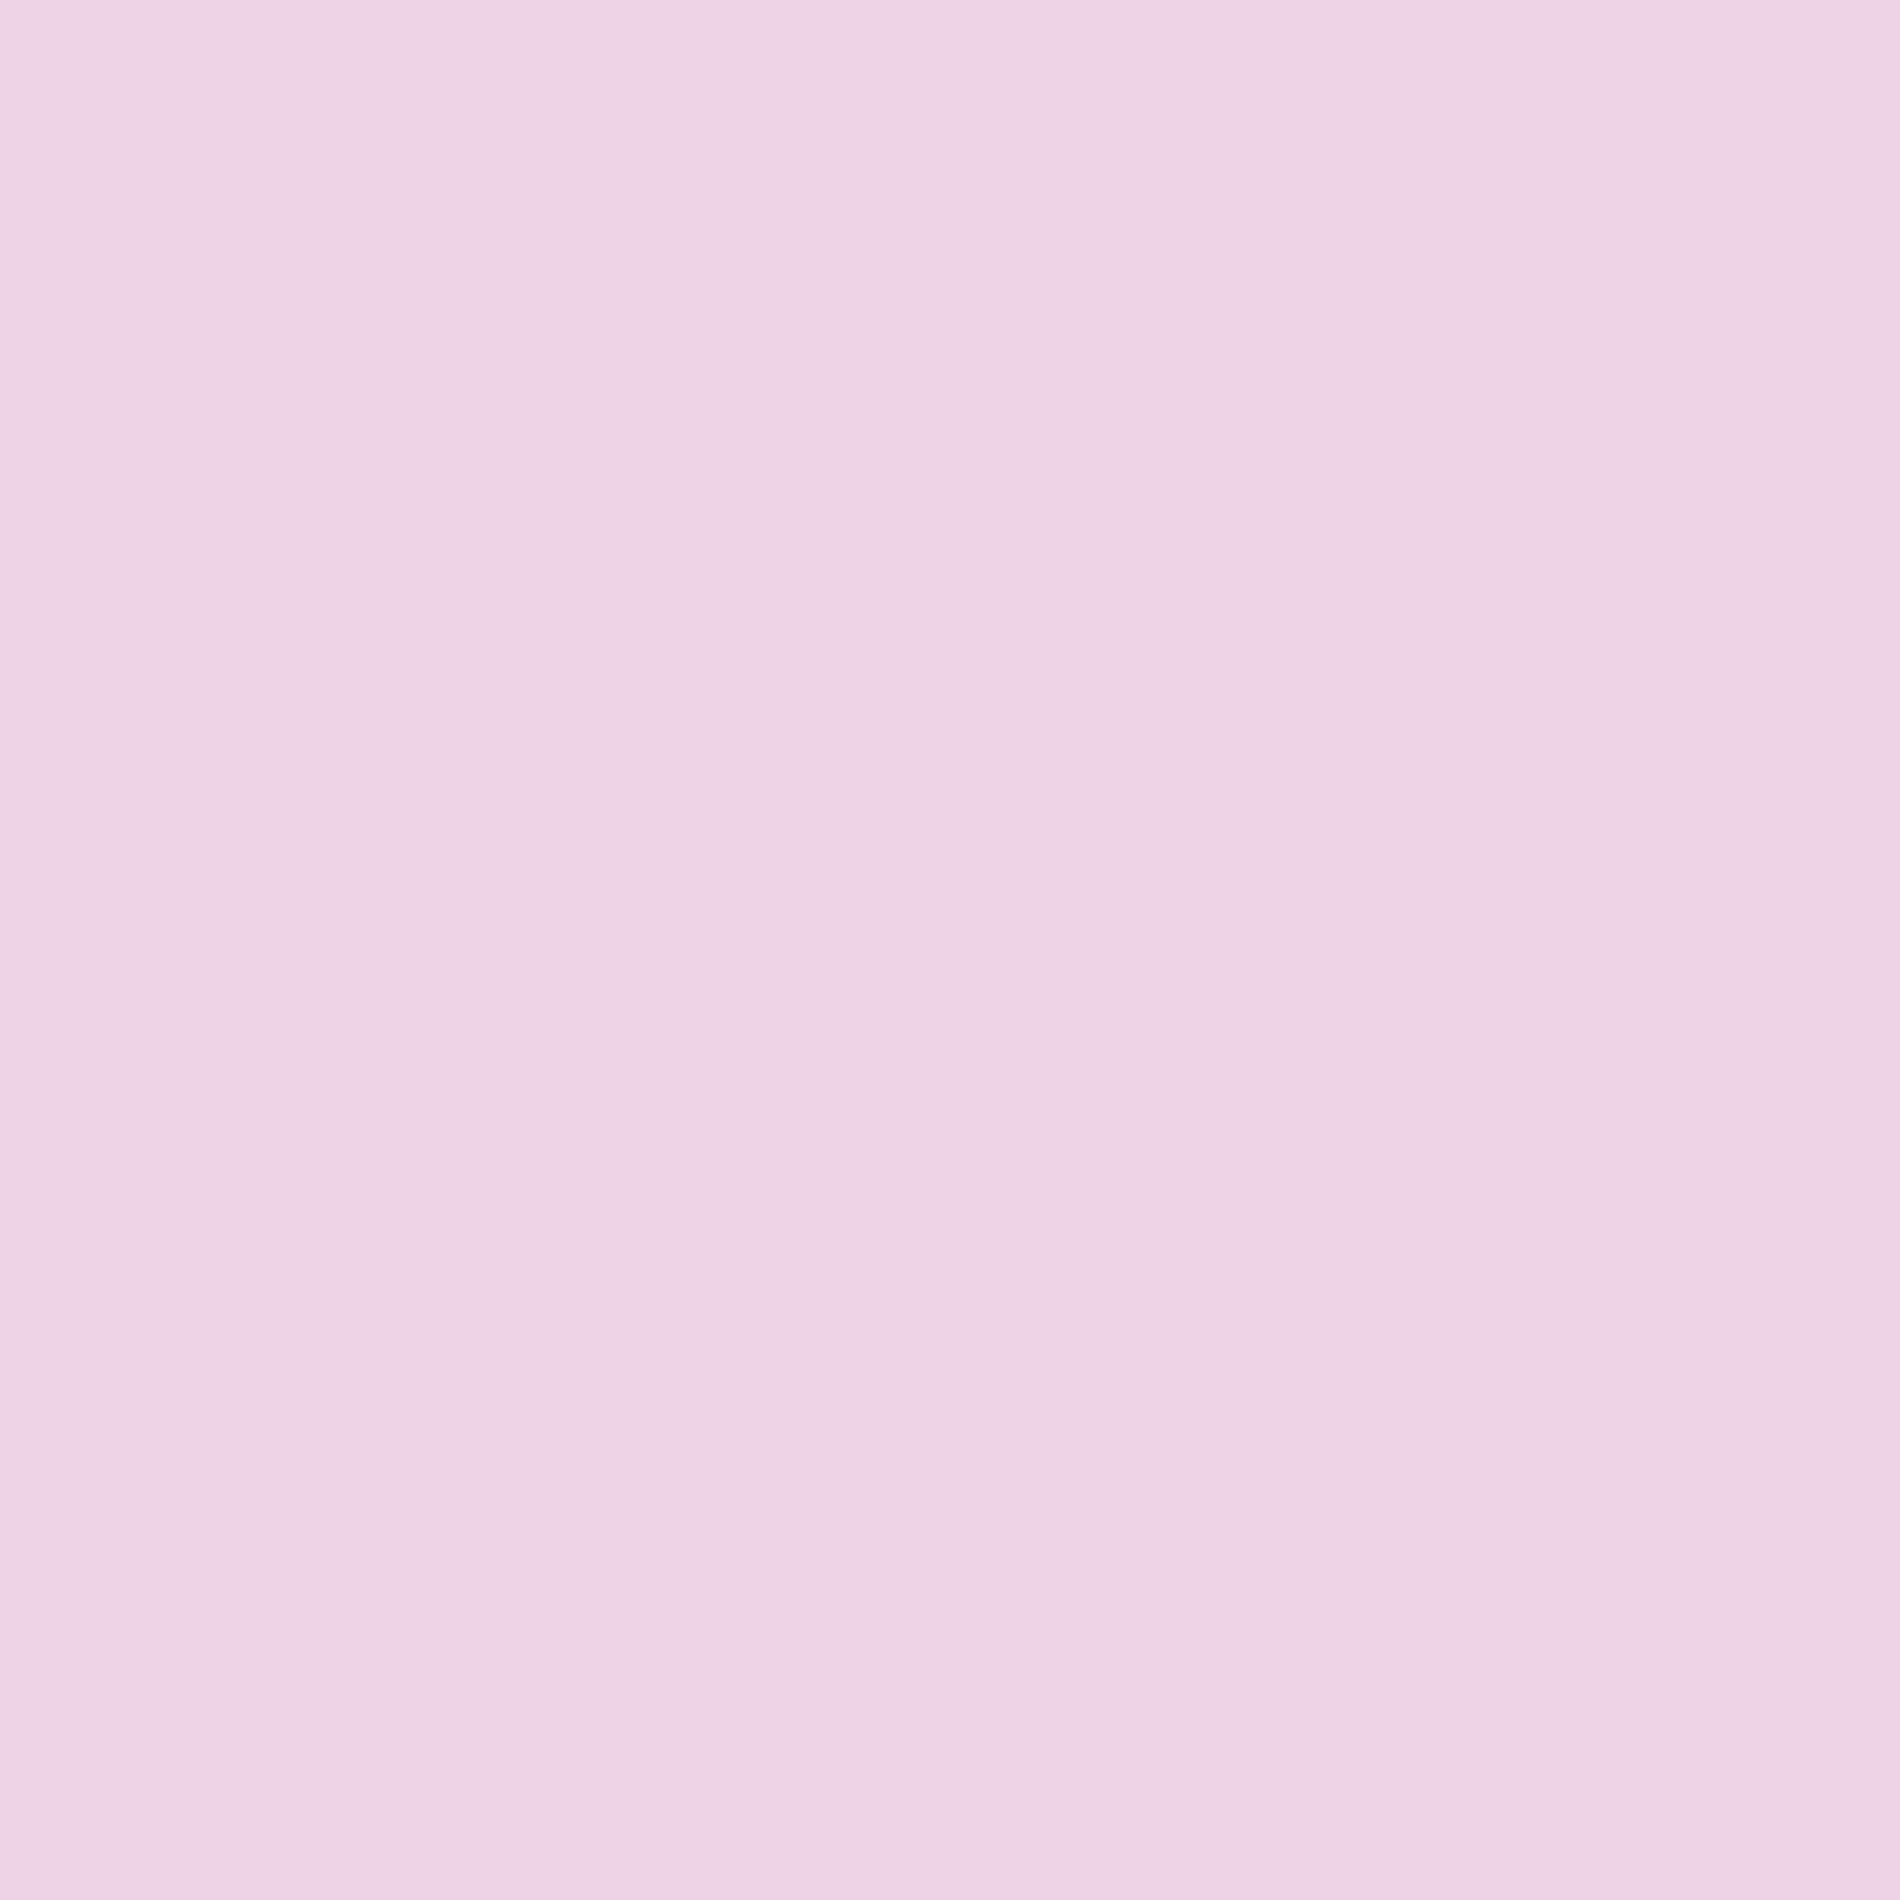 63 - rosa